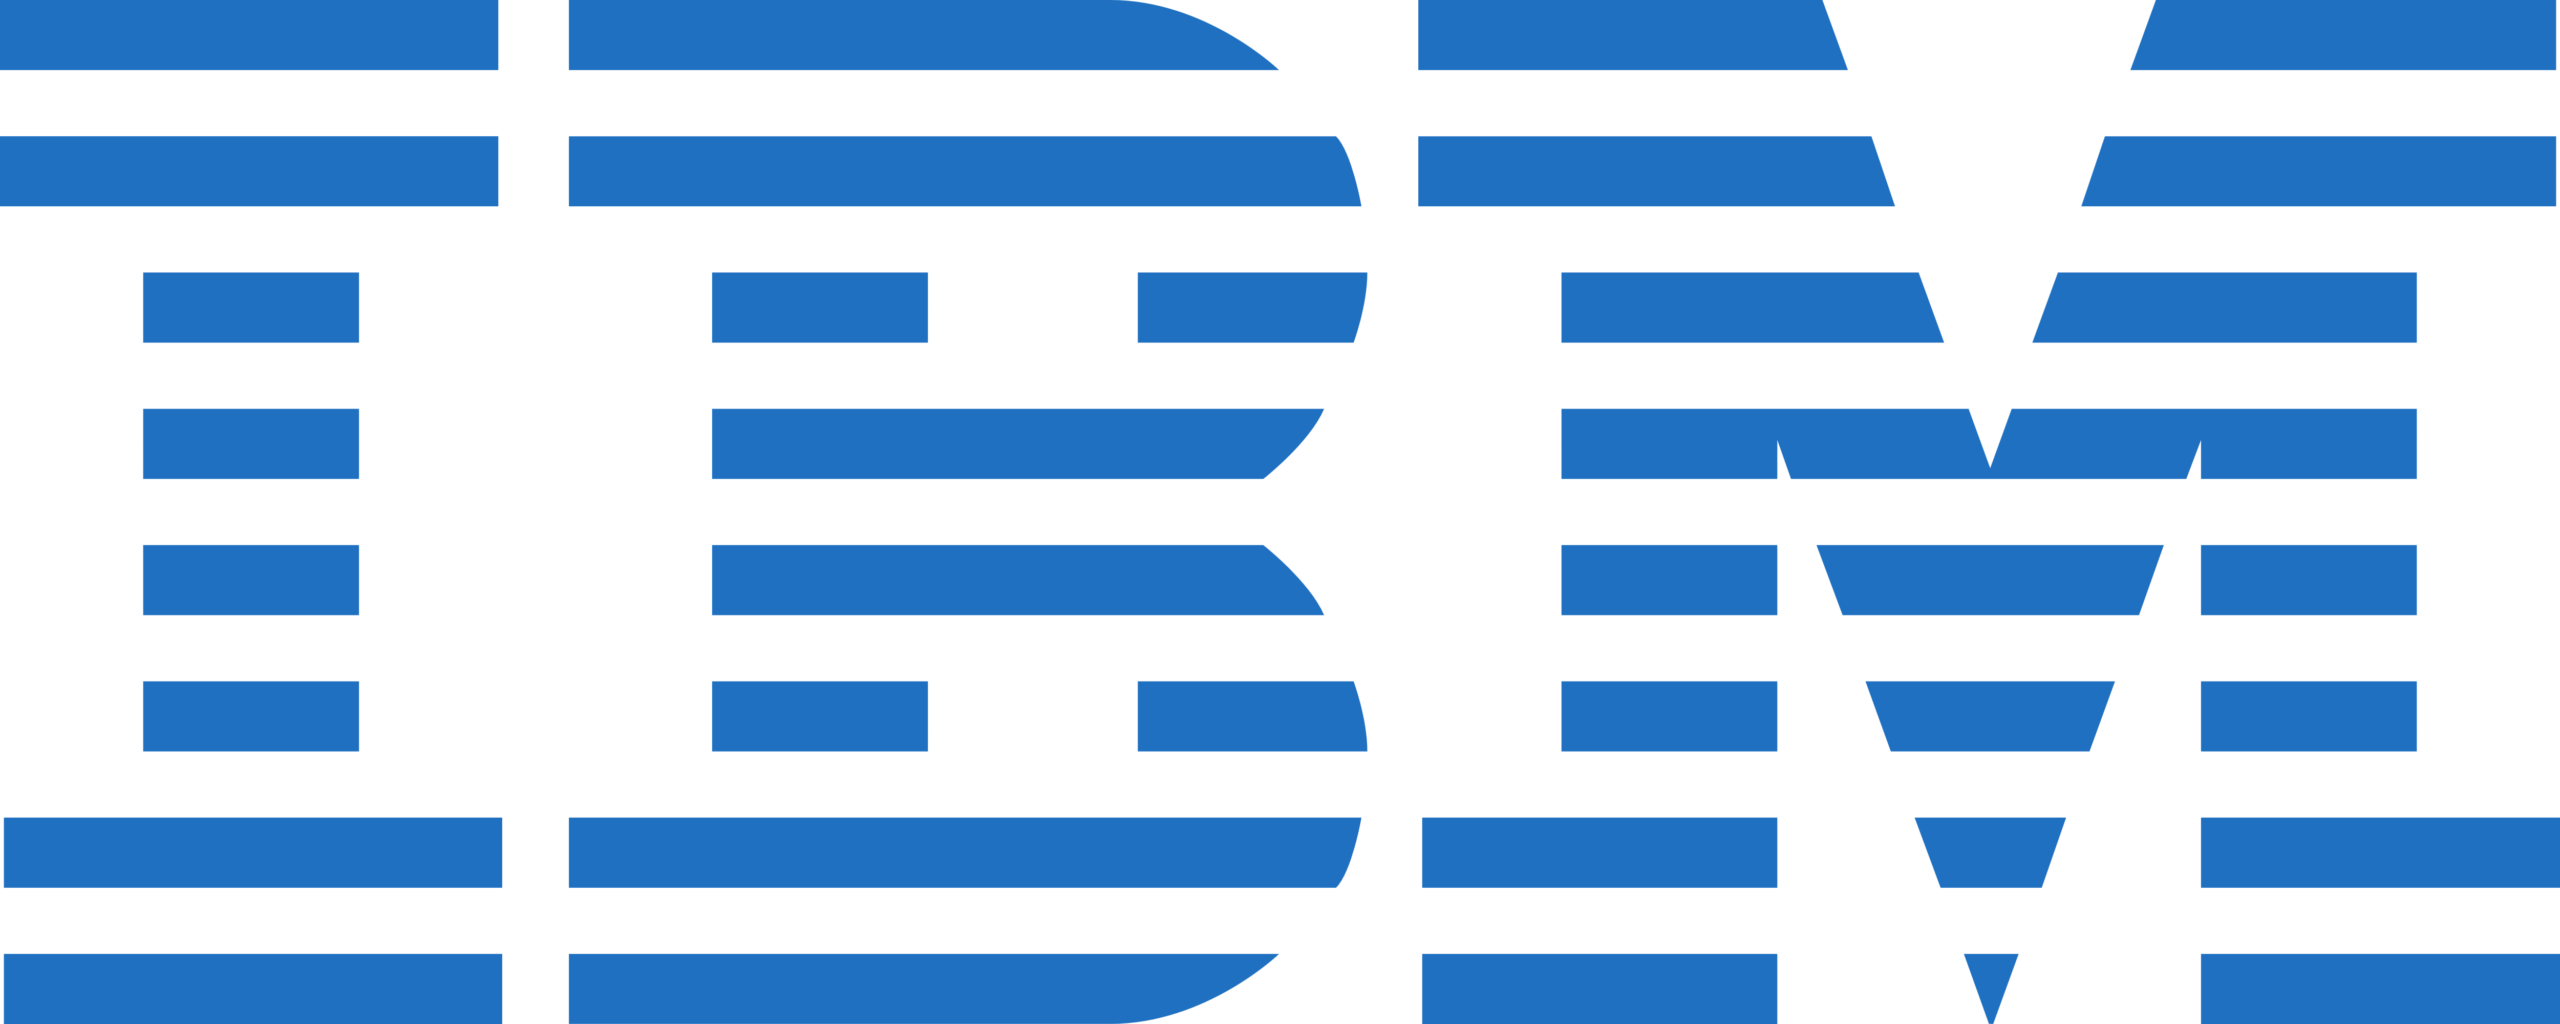 IBM_logo_logotype_emblem